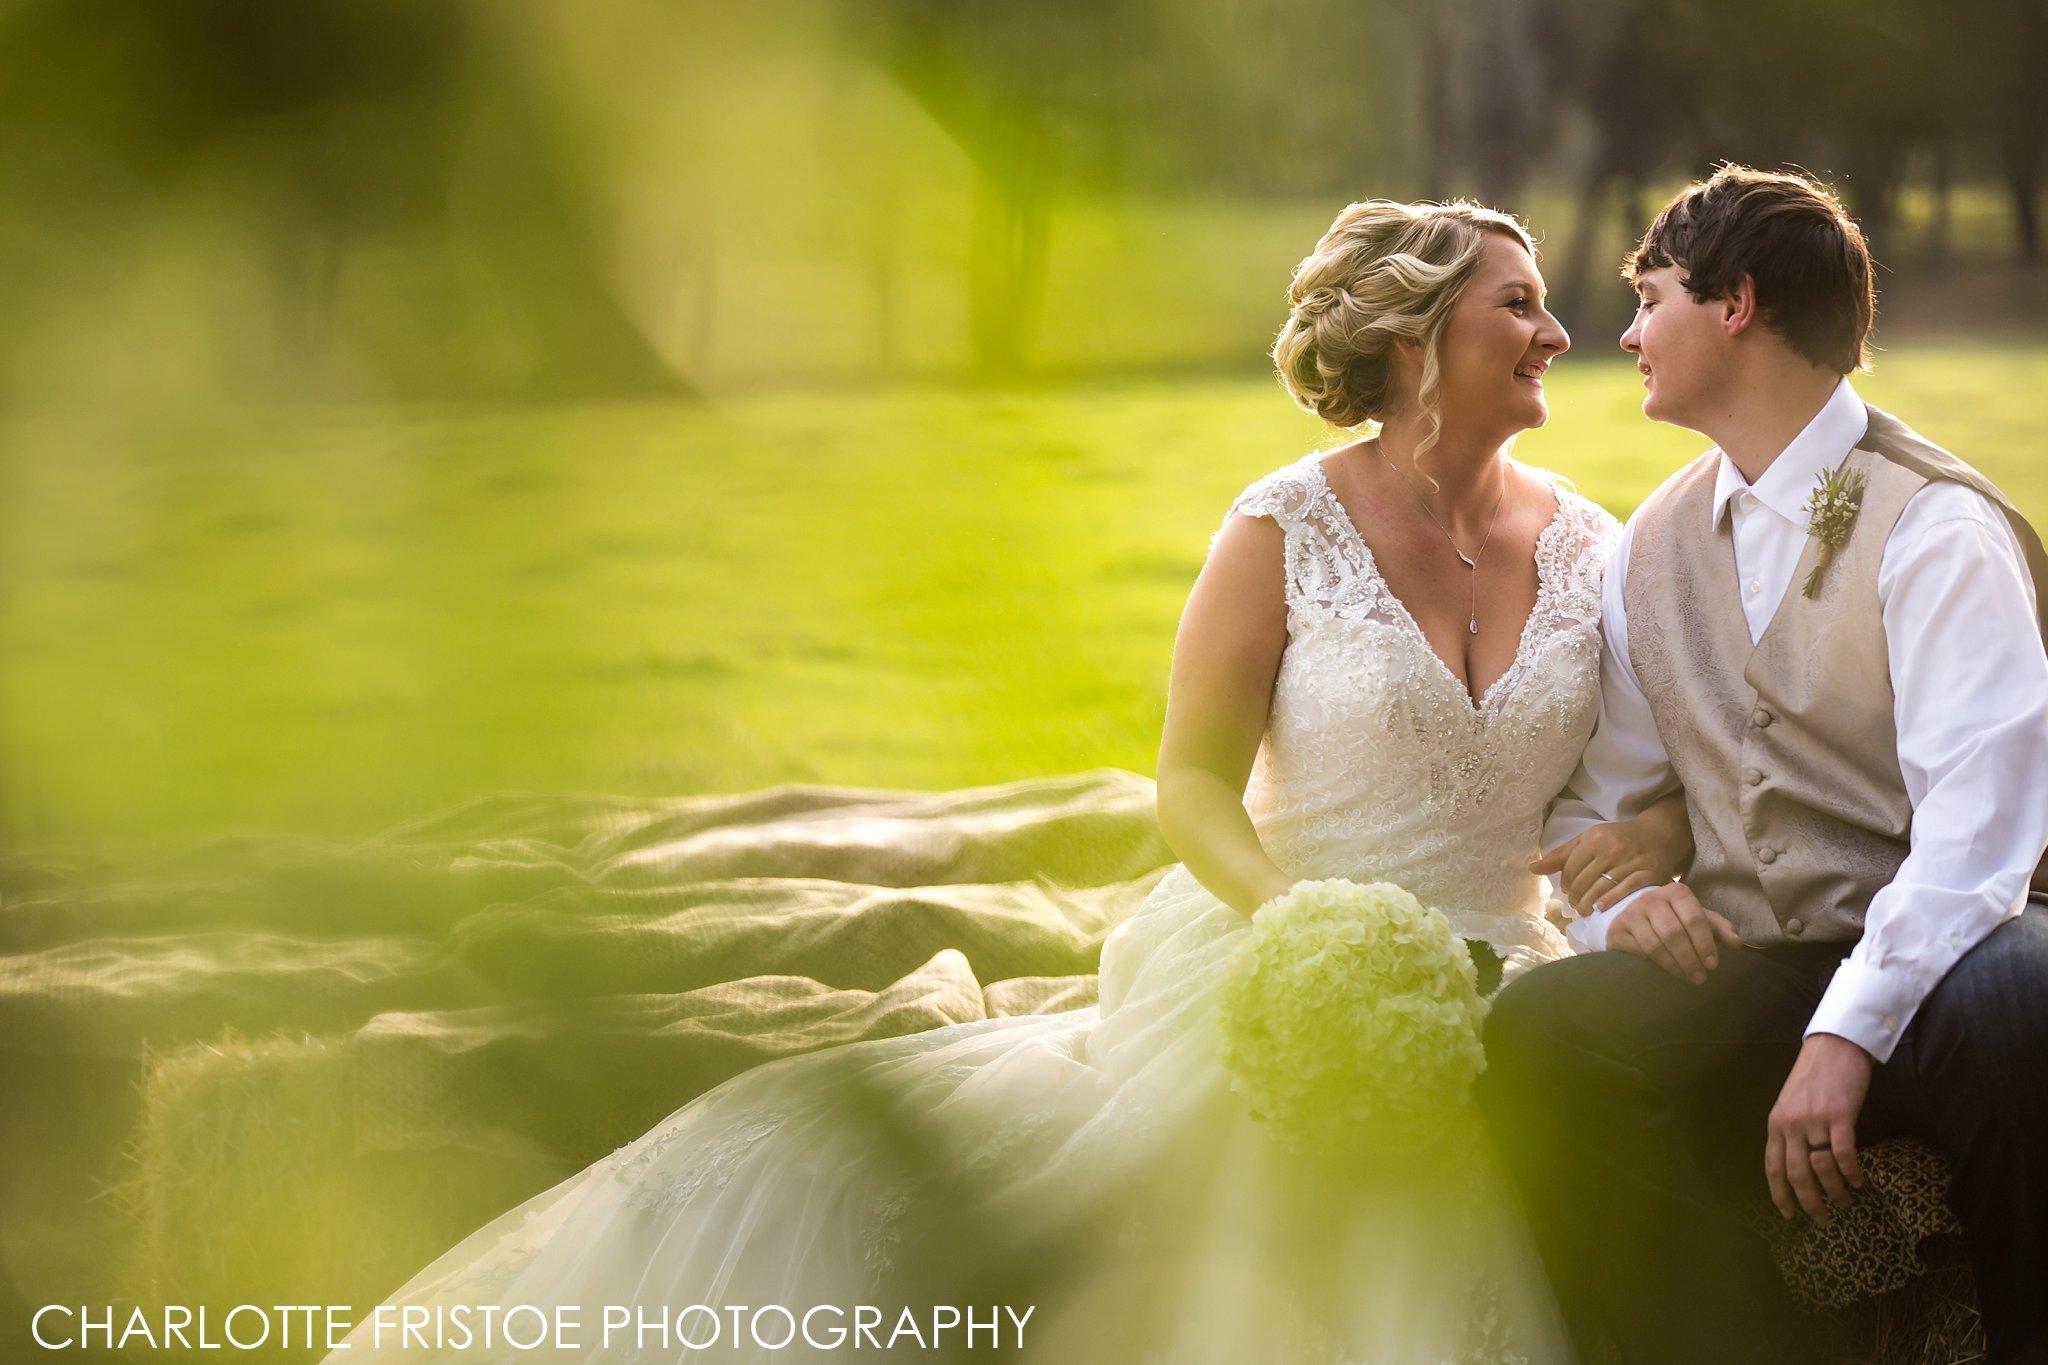 Charlotte Fristoe Photography-59.jpg